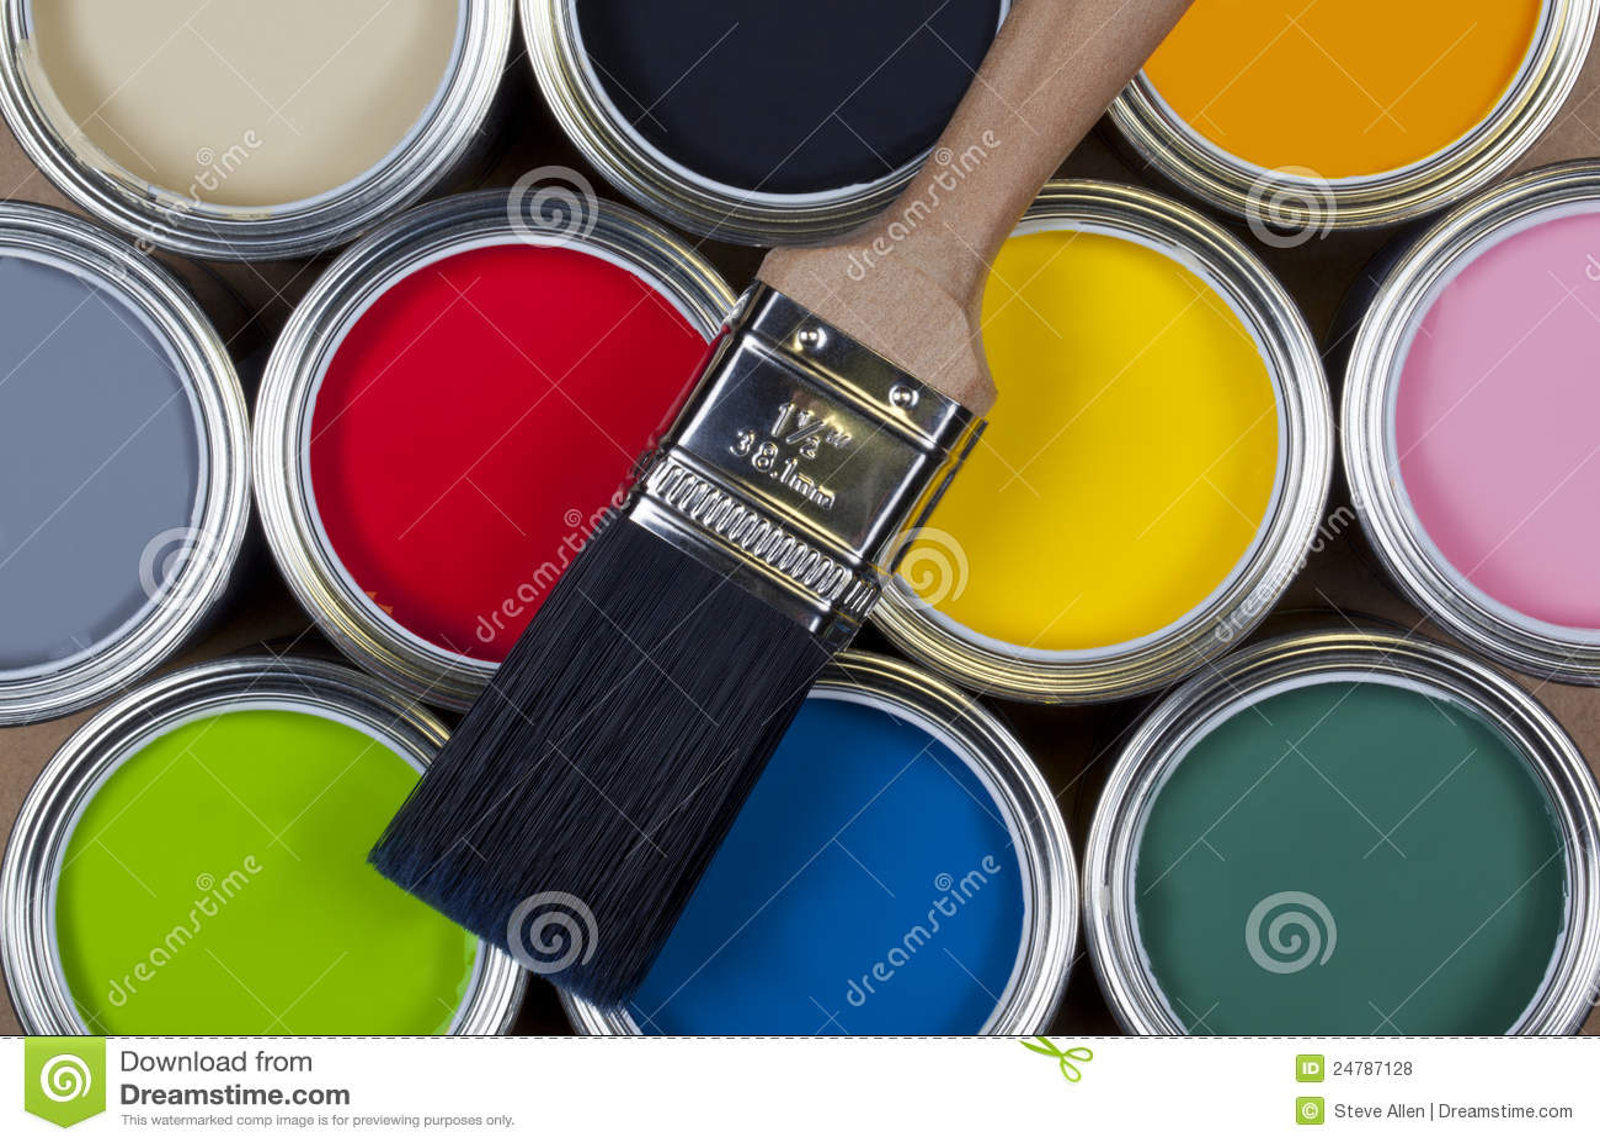 Paint - Cans of colorful emulsion paint